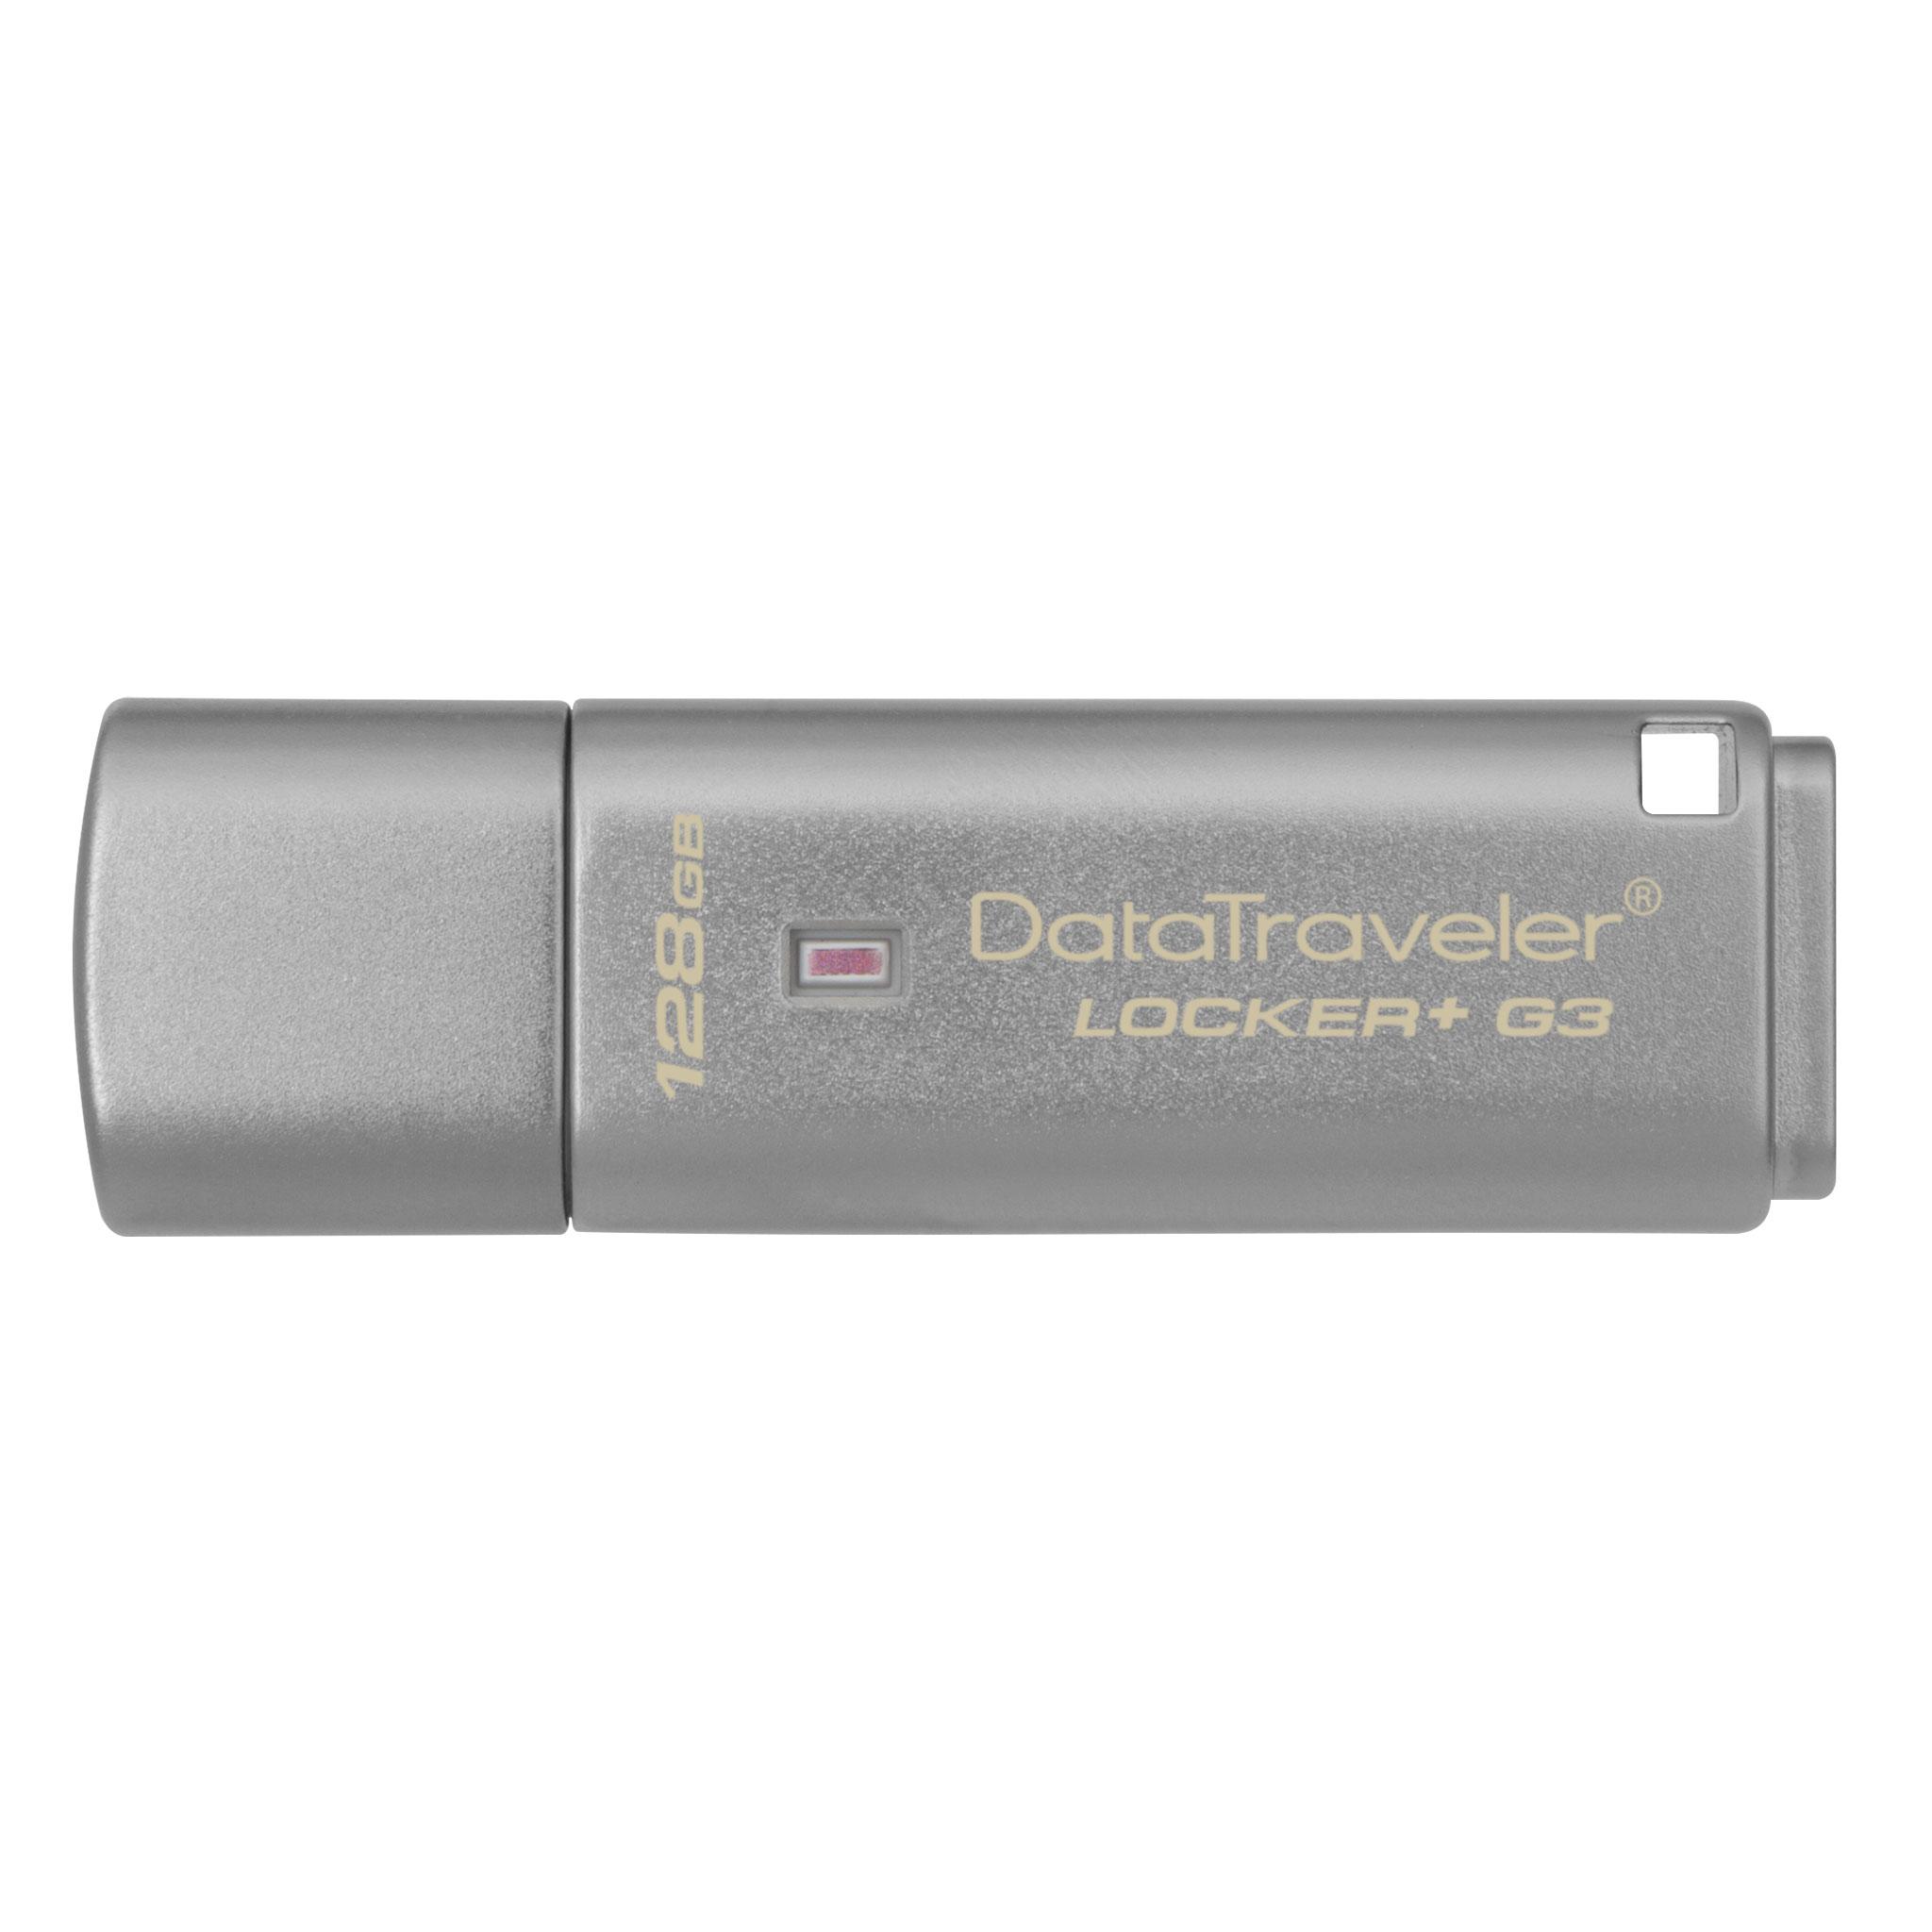 128GB USB 3.0 DT Locker+ G3 (vc. A. Data Security) - DTLPG3/128GB